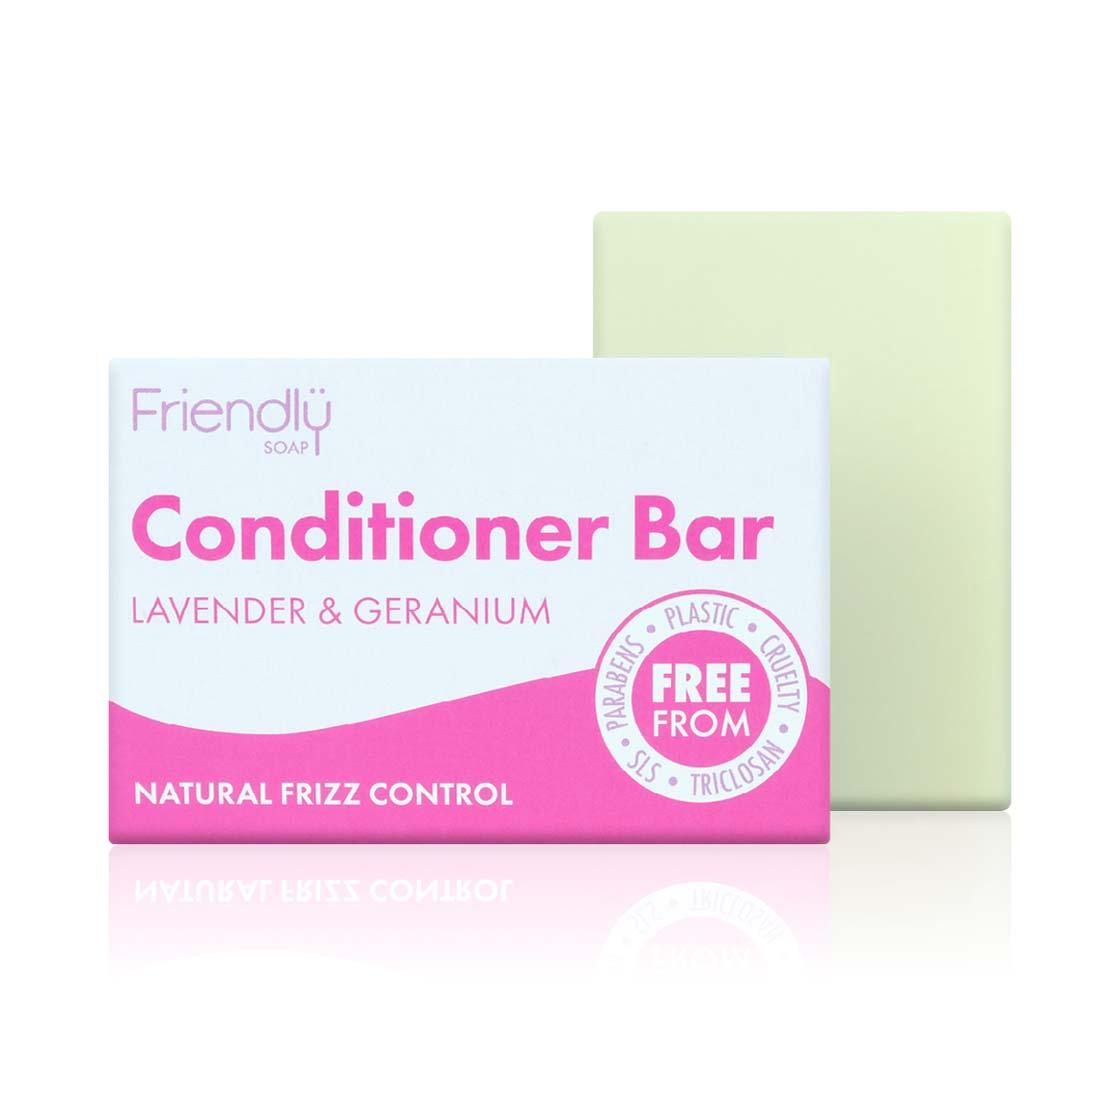 Conditioner Bar - Lavender & Geranium by Friendly Soap